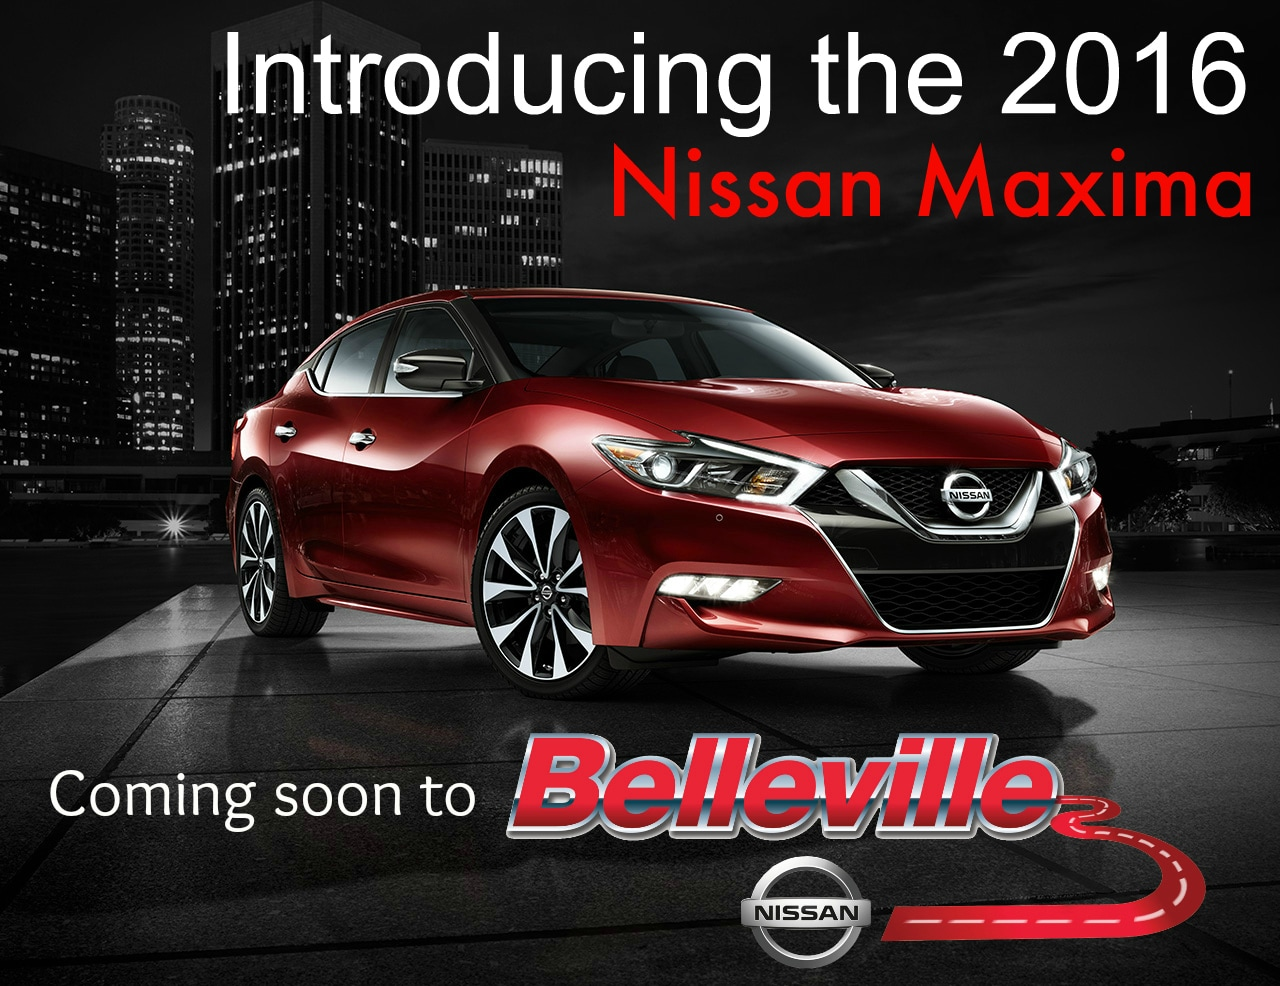 2016 NISSAN MAXIMA | Belleville Nissan